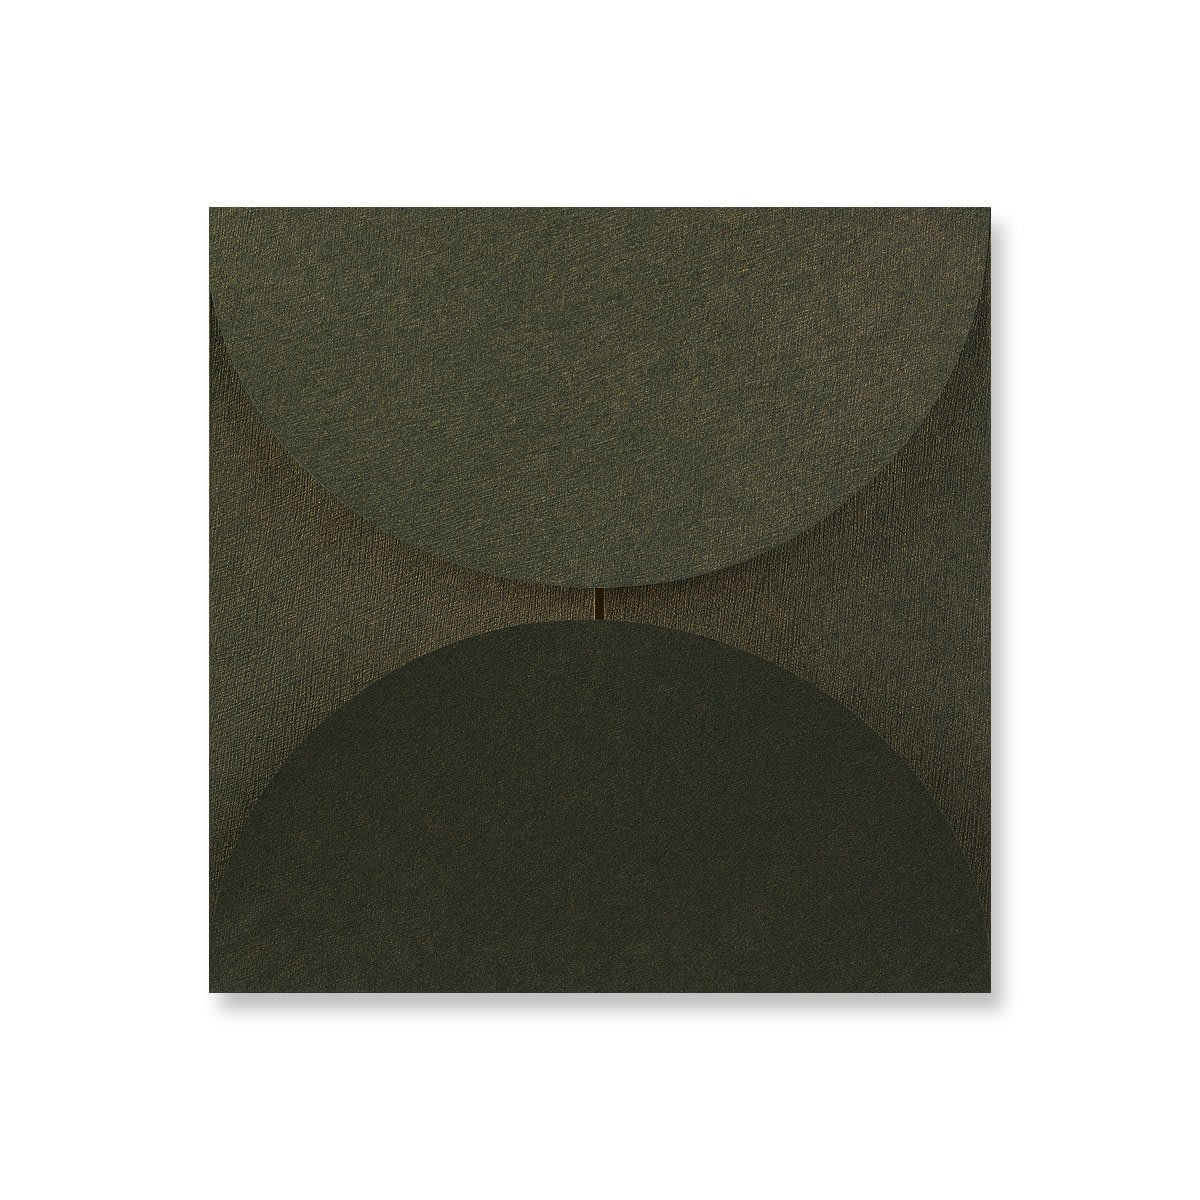 145 x 145mm CHAMPAGNE GREEN POUCHETTES